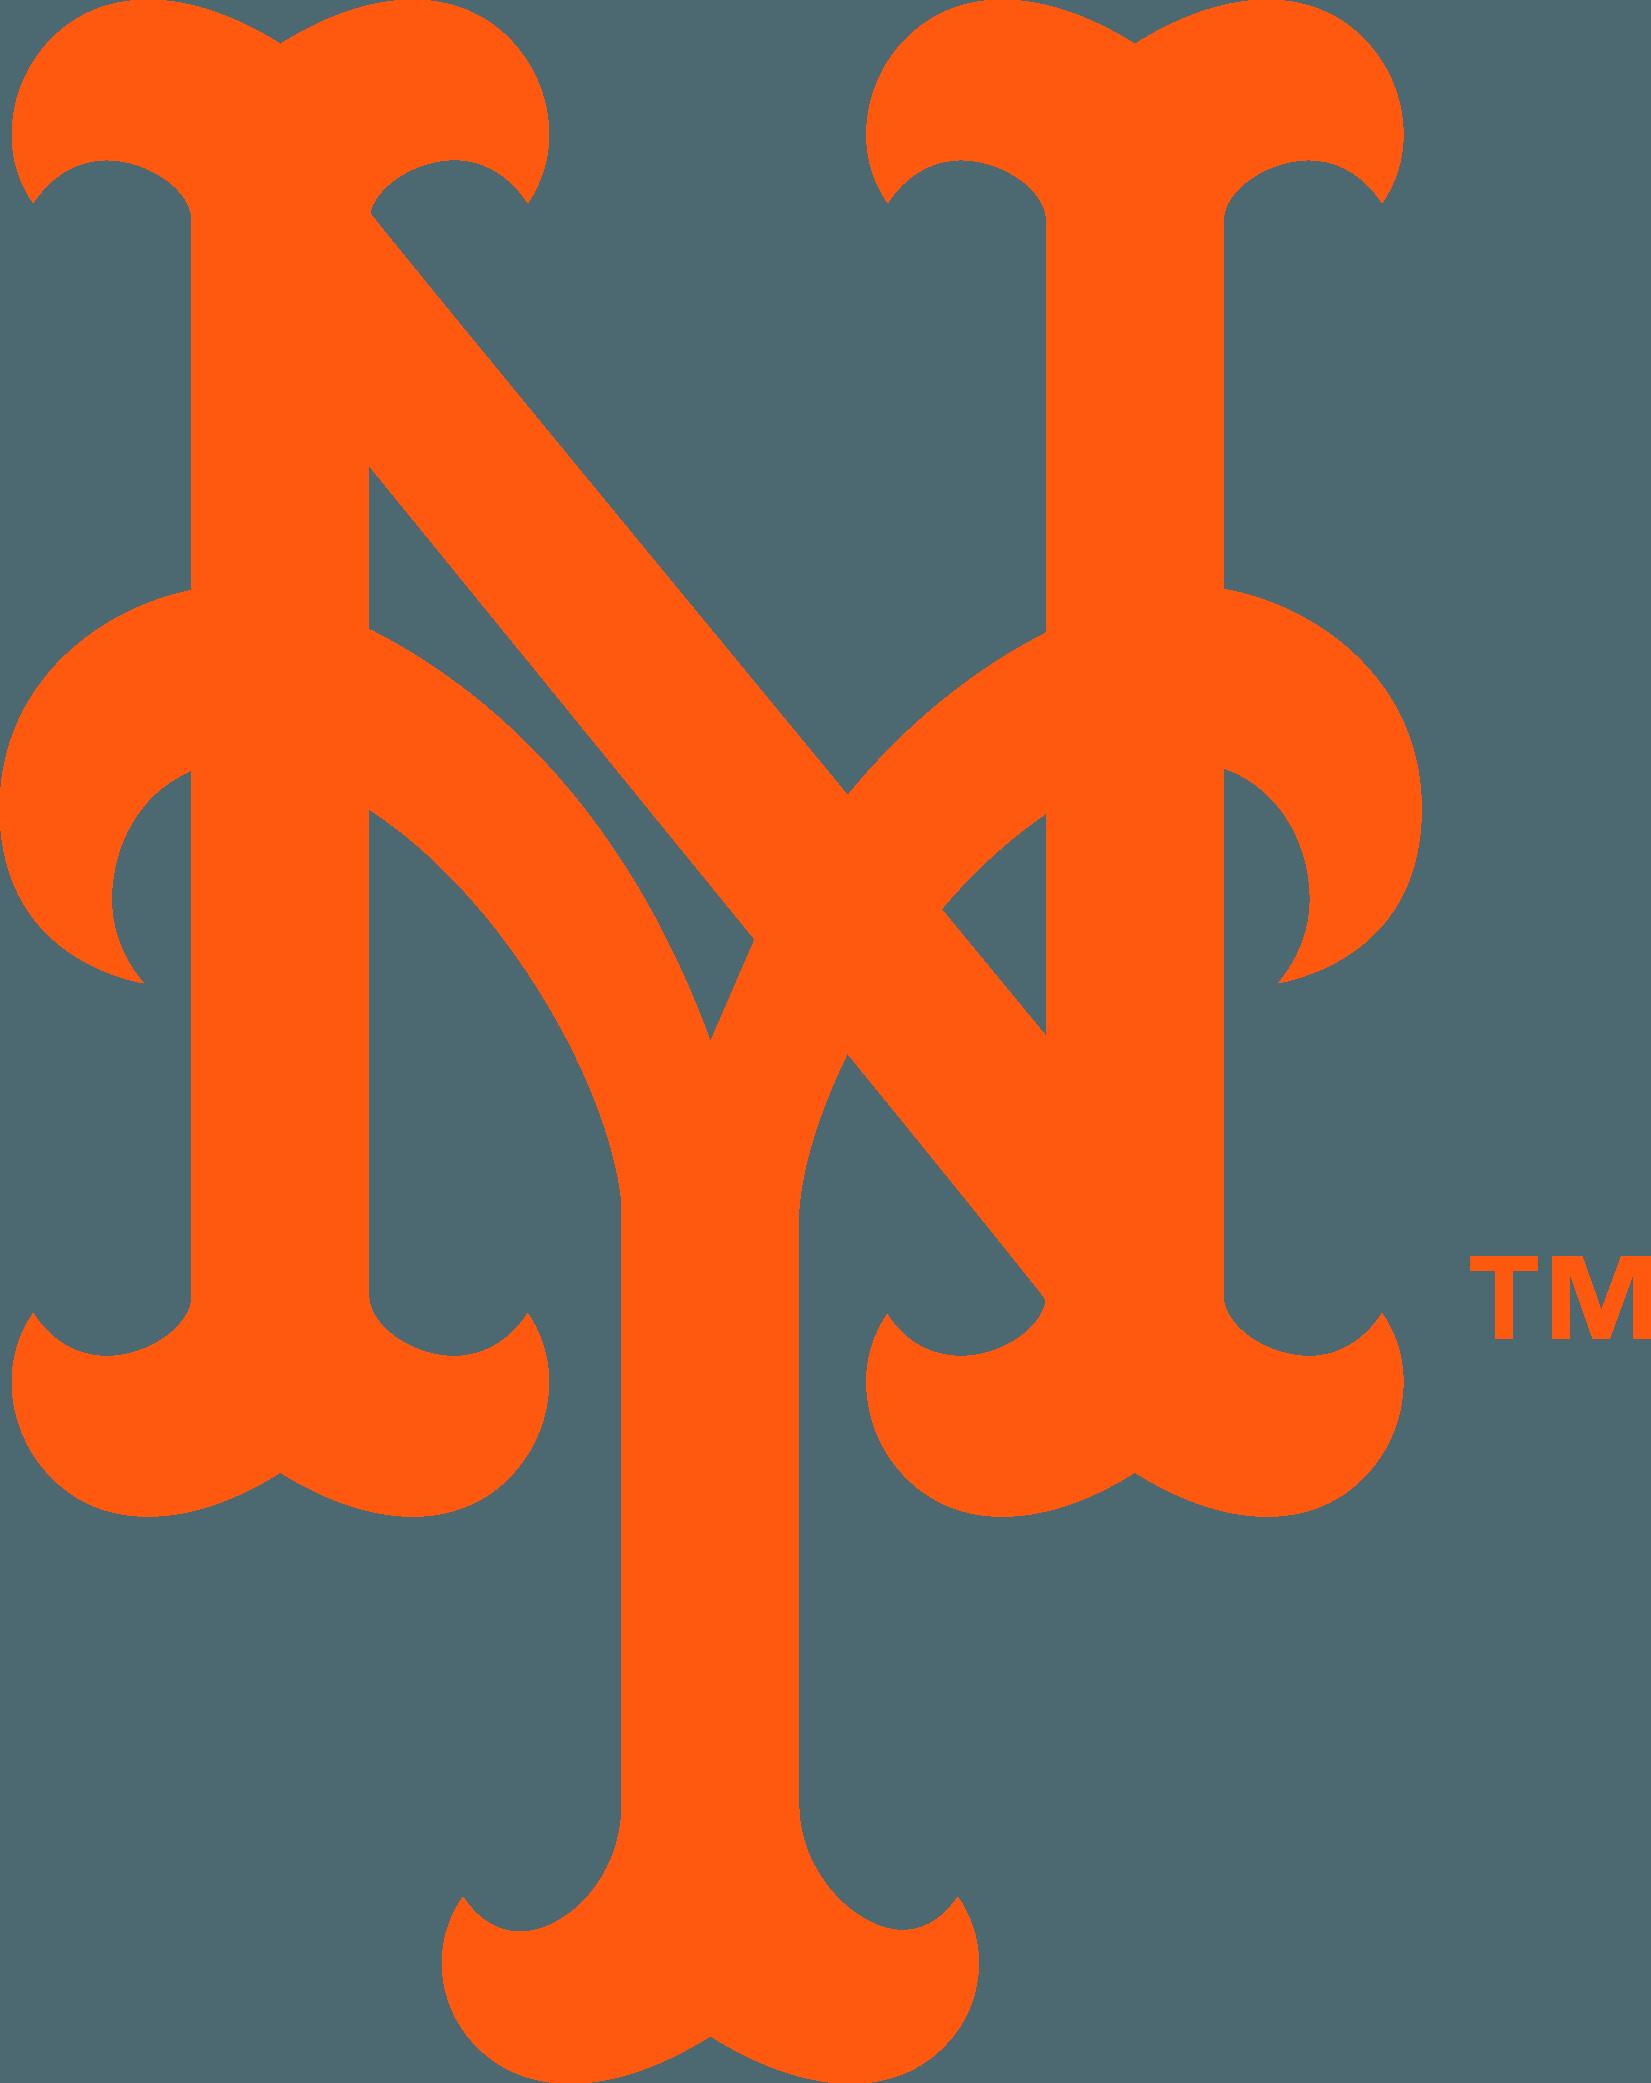 New York Mets Logo Png Image In 2020 New York Mets Logo New York Mets Machine Embroidery Logo